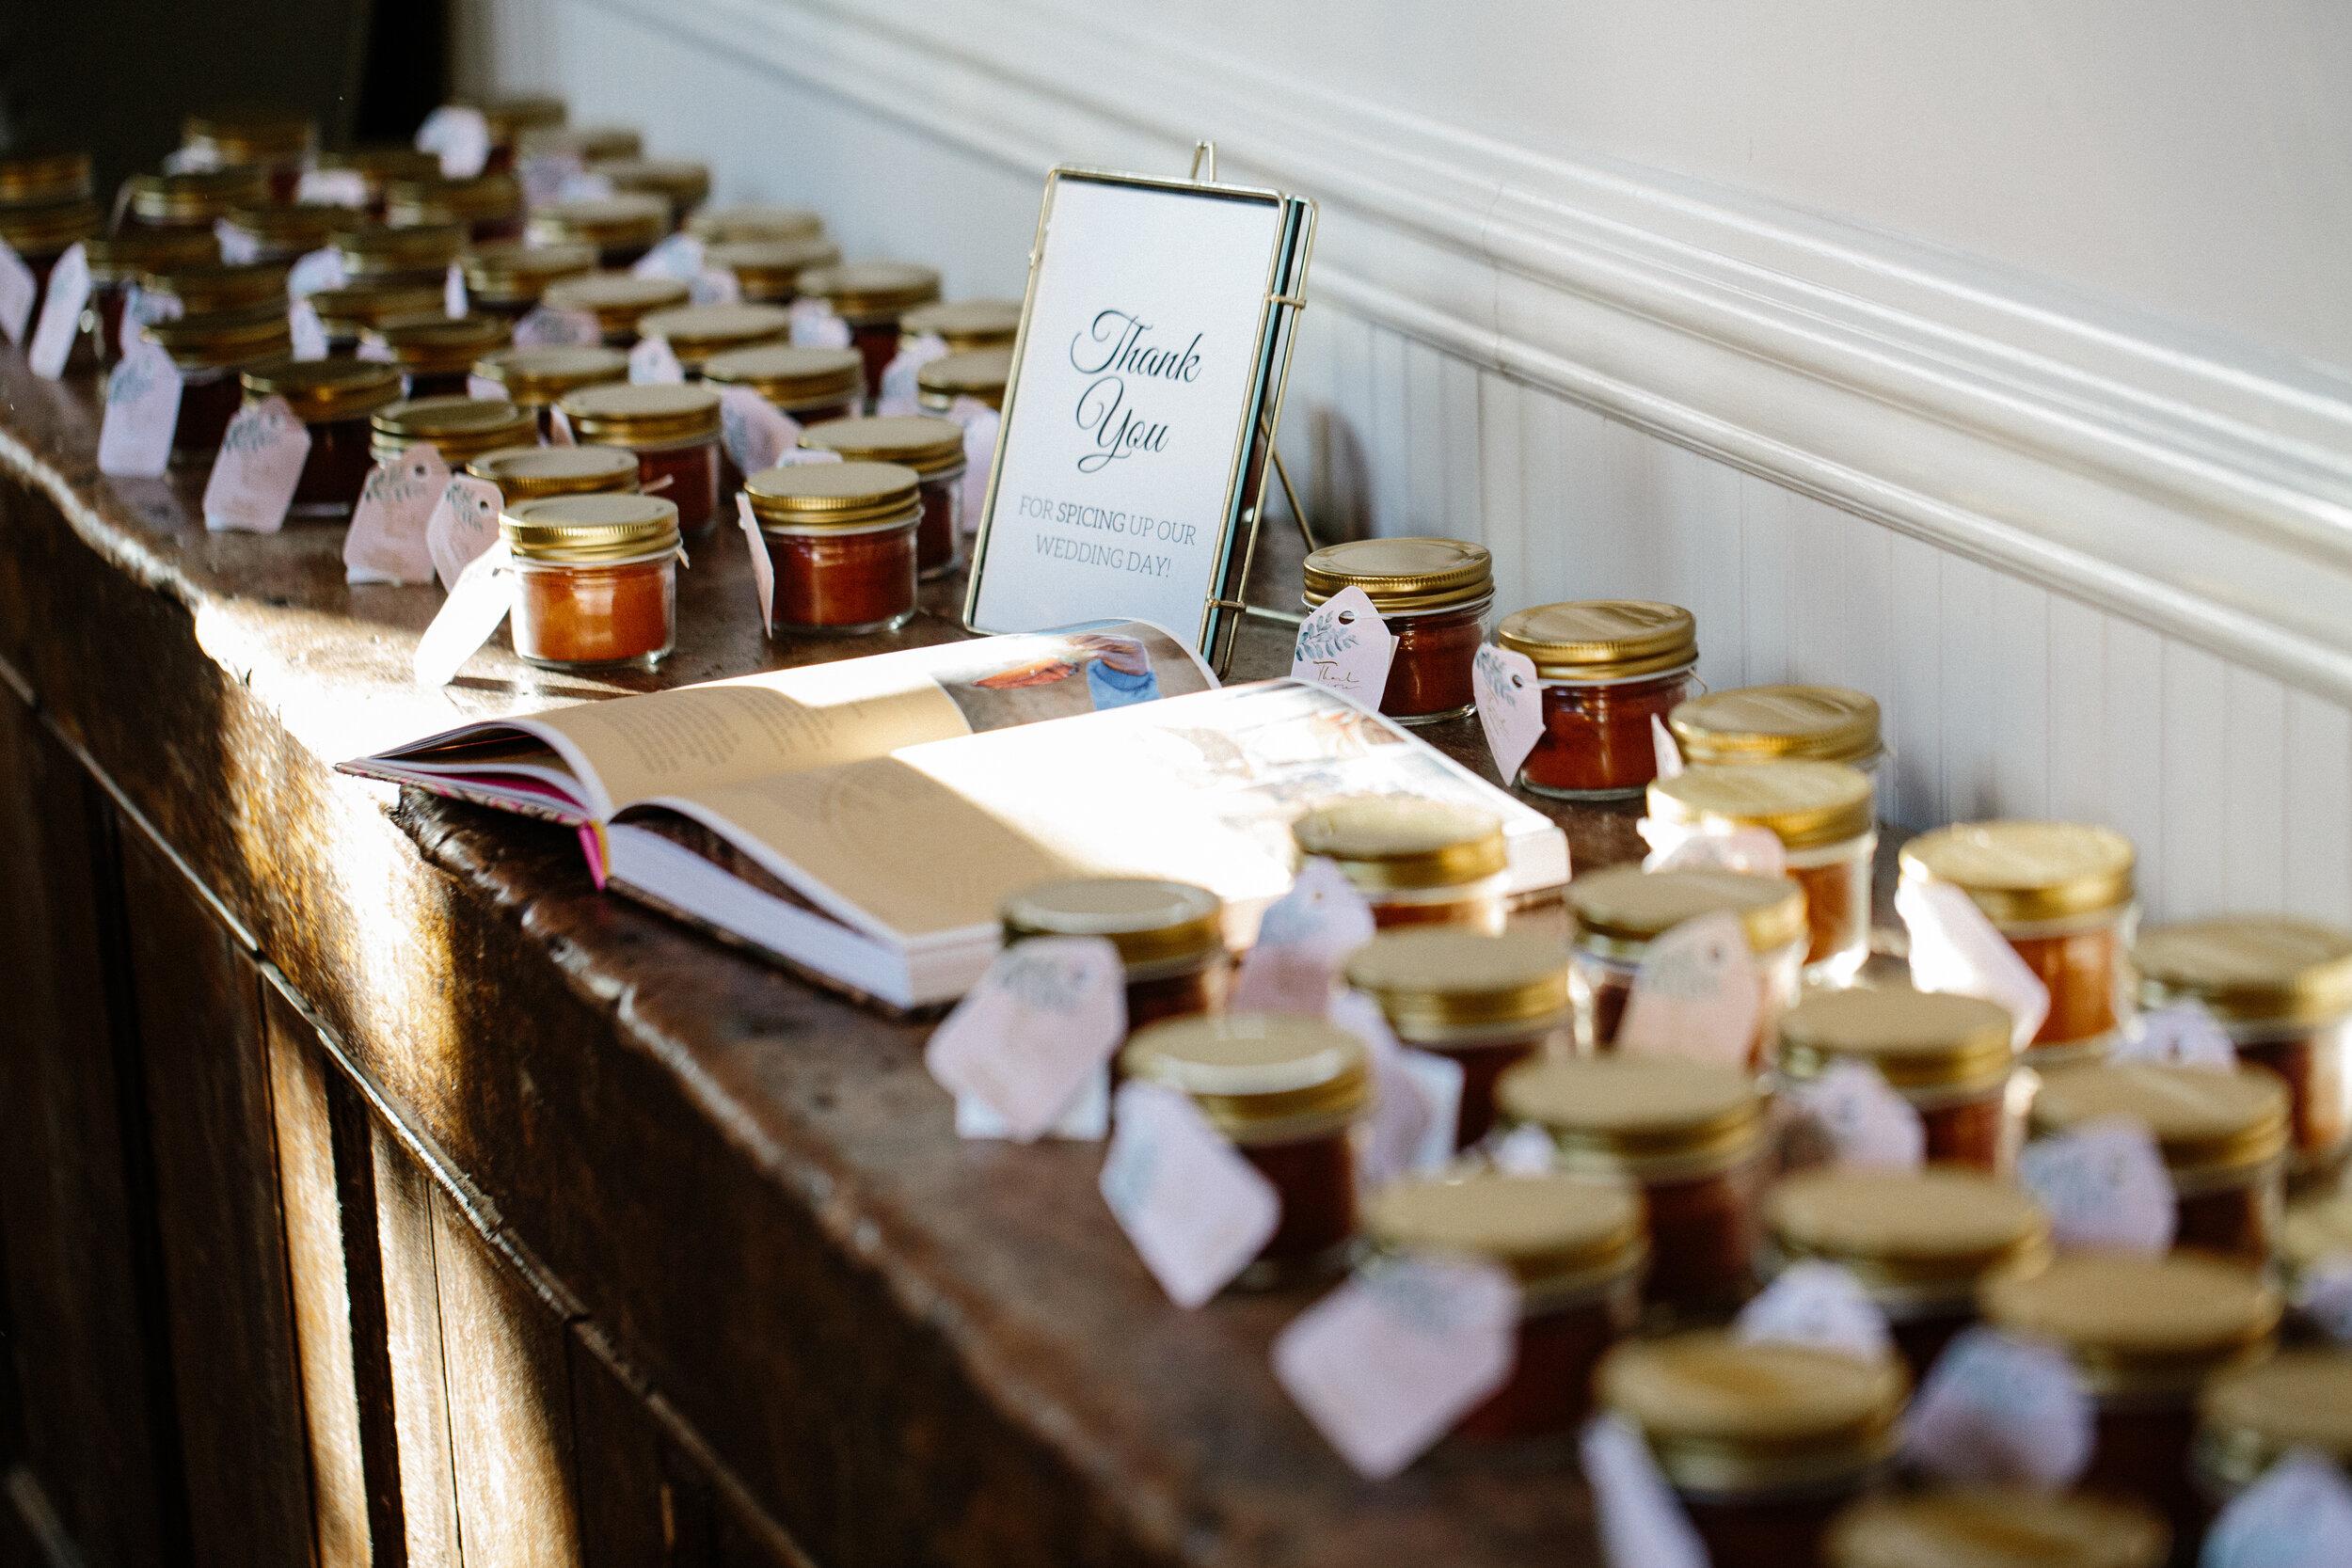 Shante-Asteway-Wedding-Andrew-Roby-Events-11.jpg